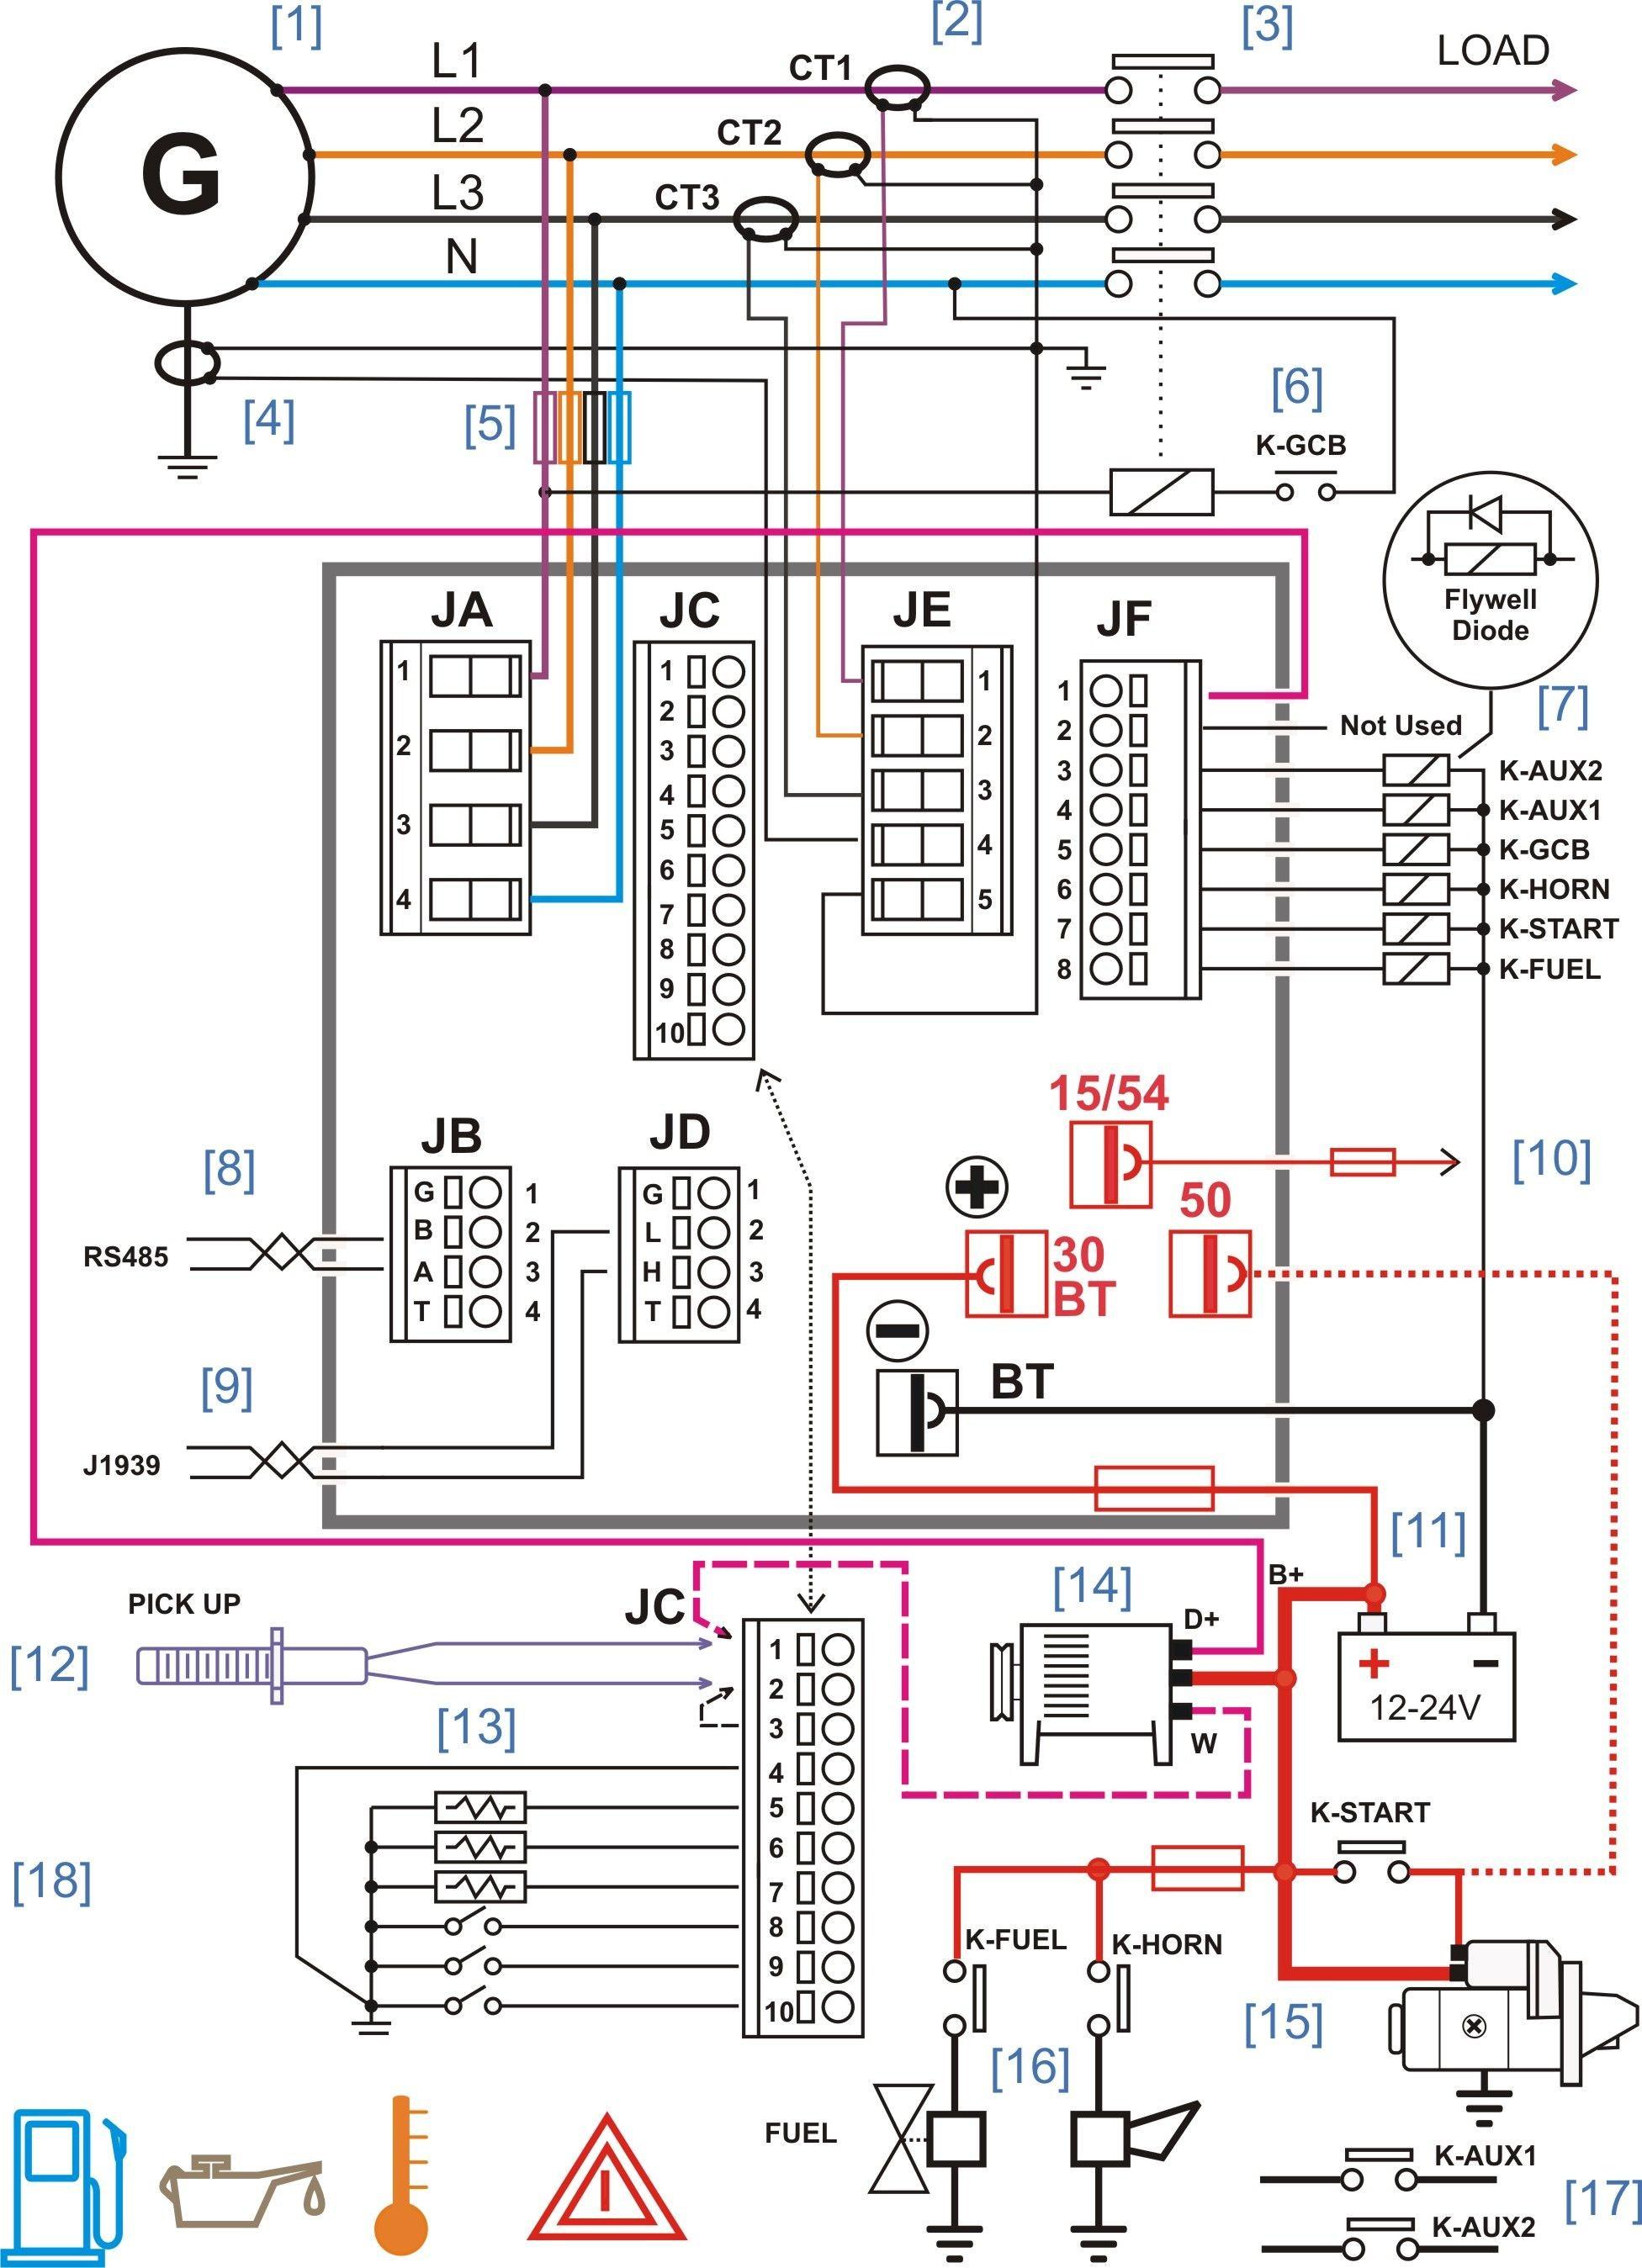 Portable Generator Transfer Switch Wiring Diagram - Wiring Diagram - Manual Transfer Switch Wiring Diagram